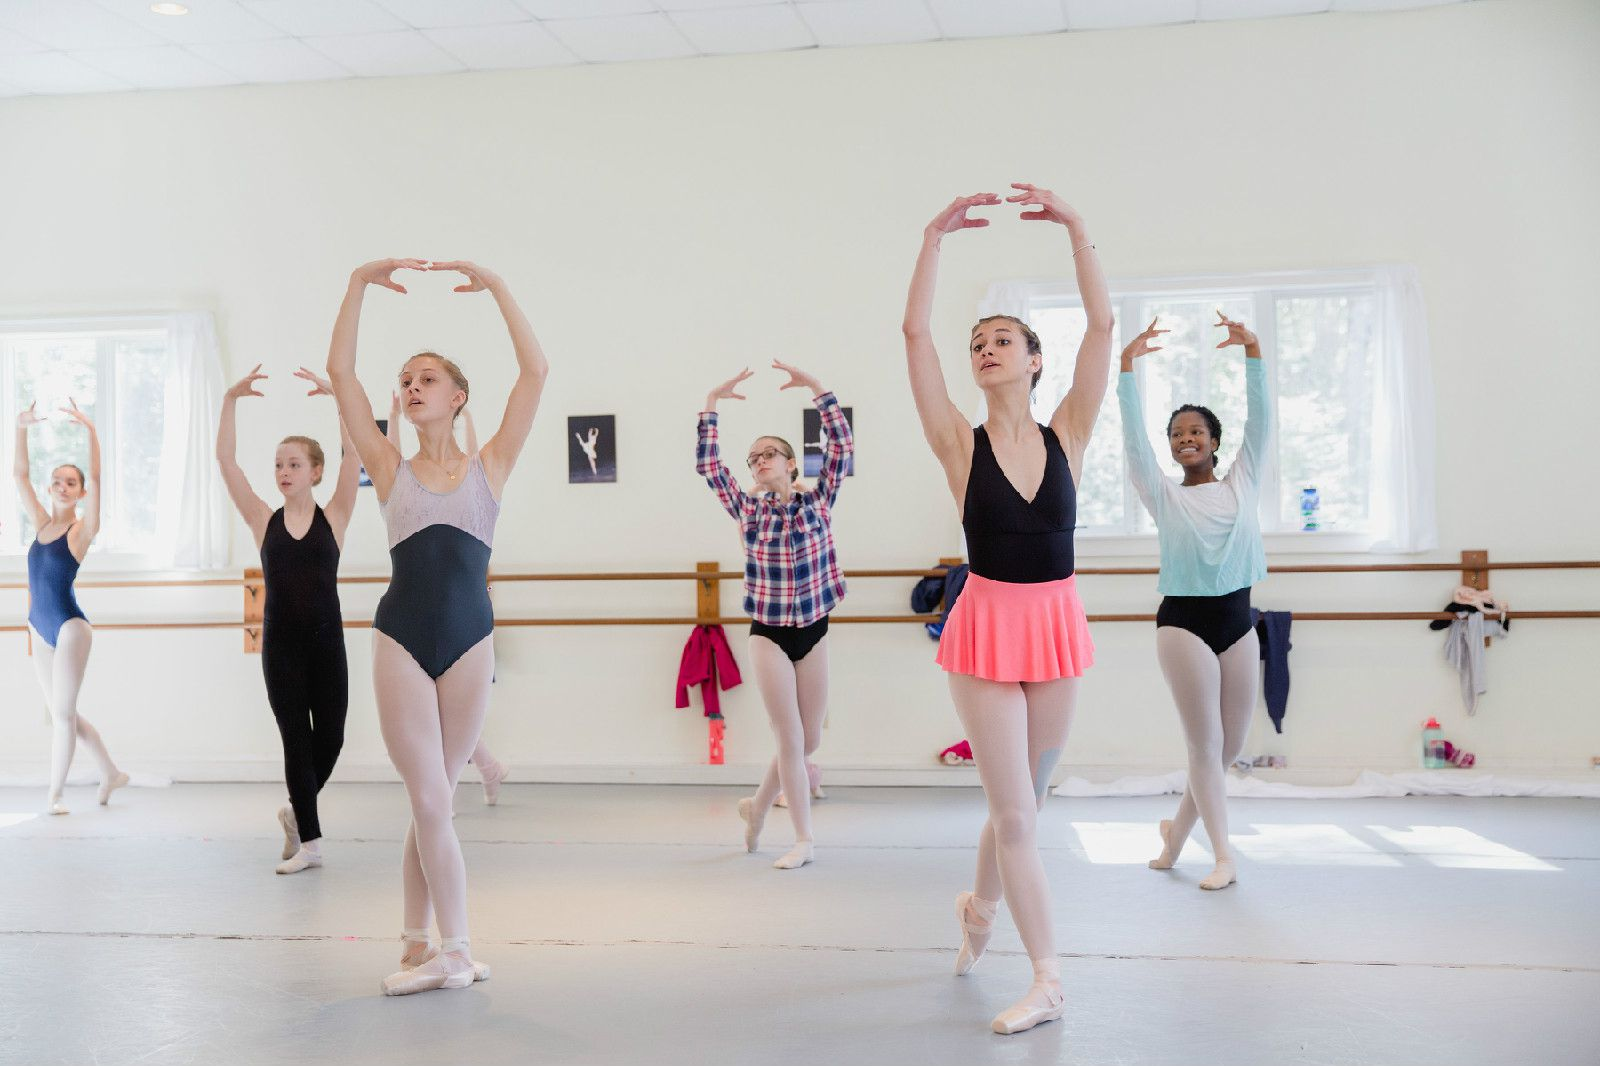 Calendaria rehearsal - photo by Erin Little